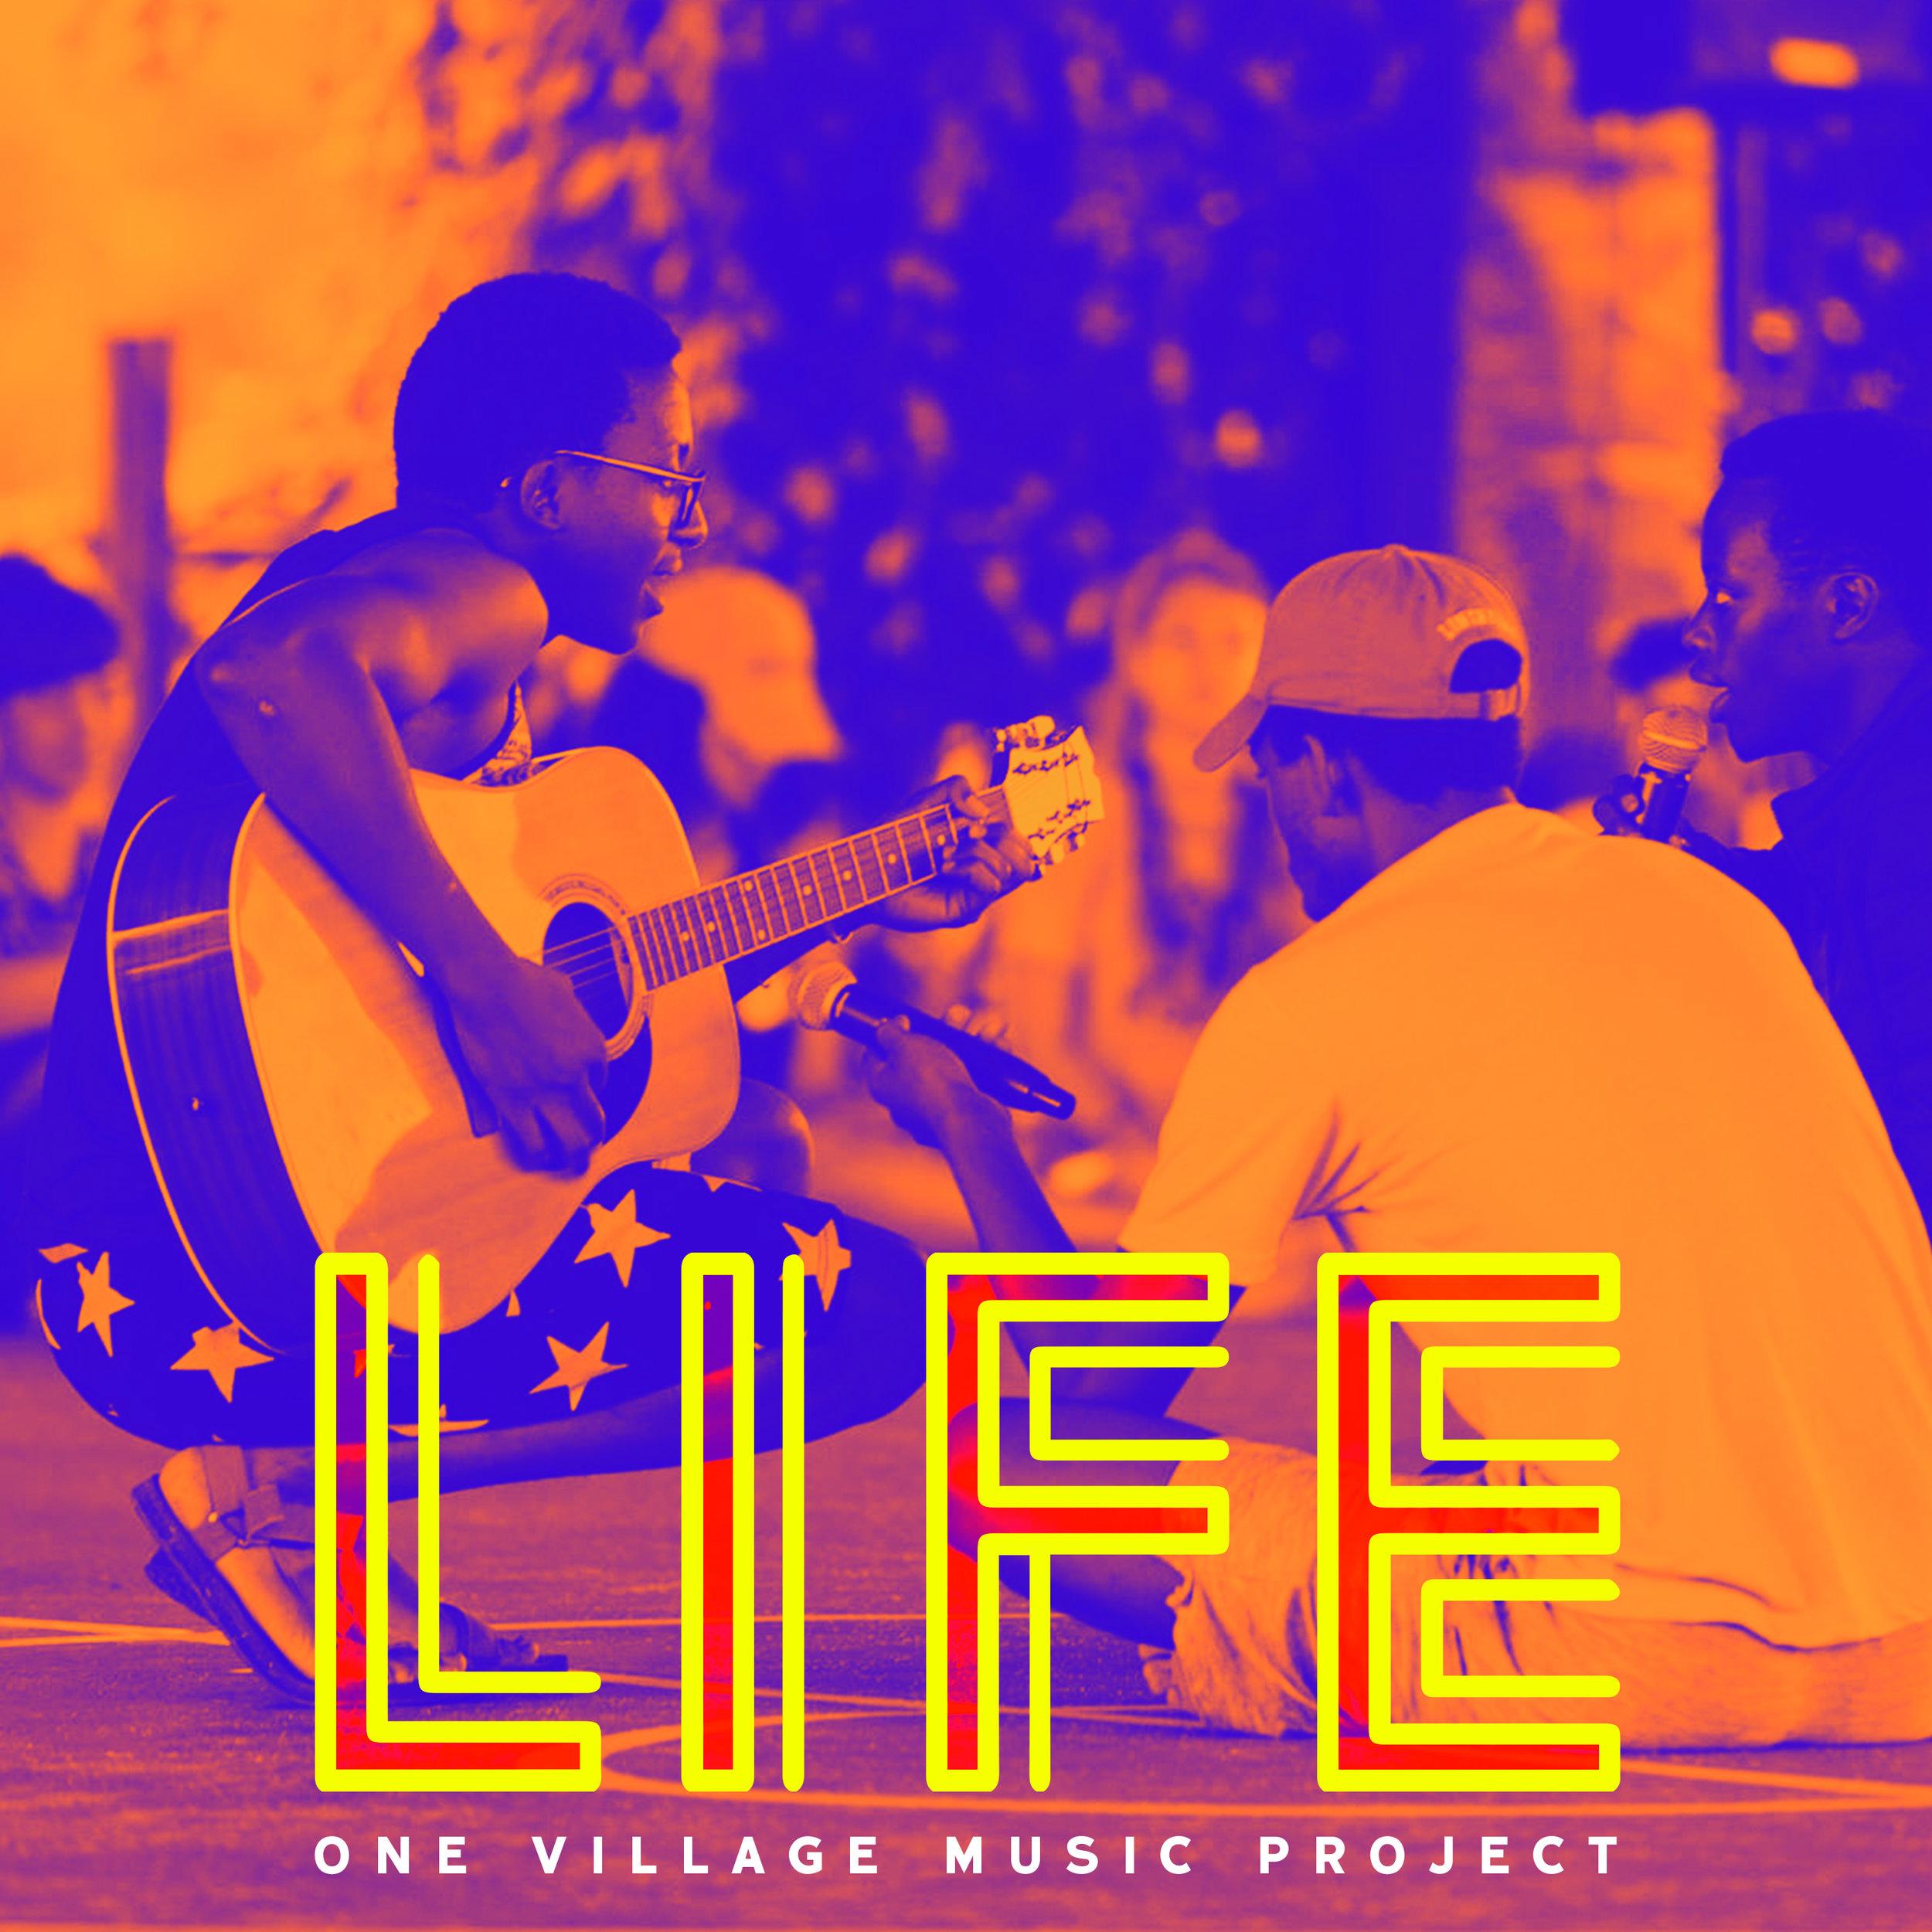 life-albumcover.jpg